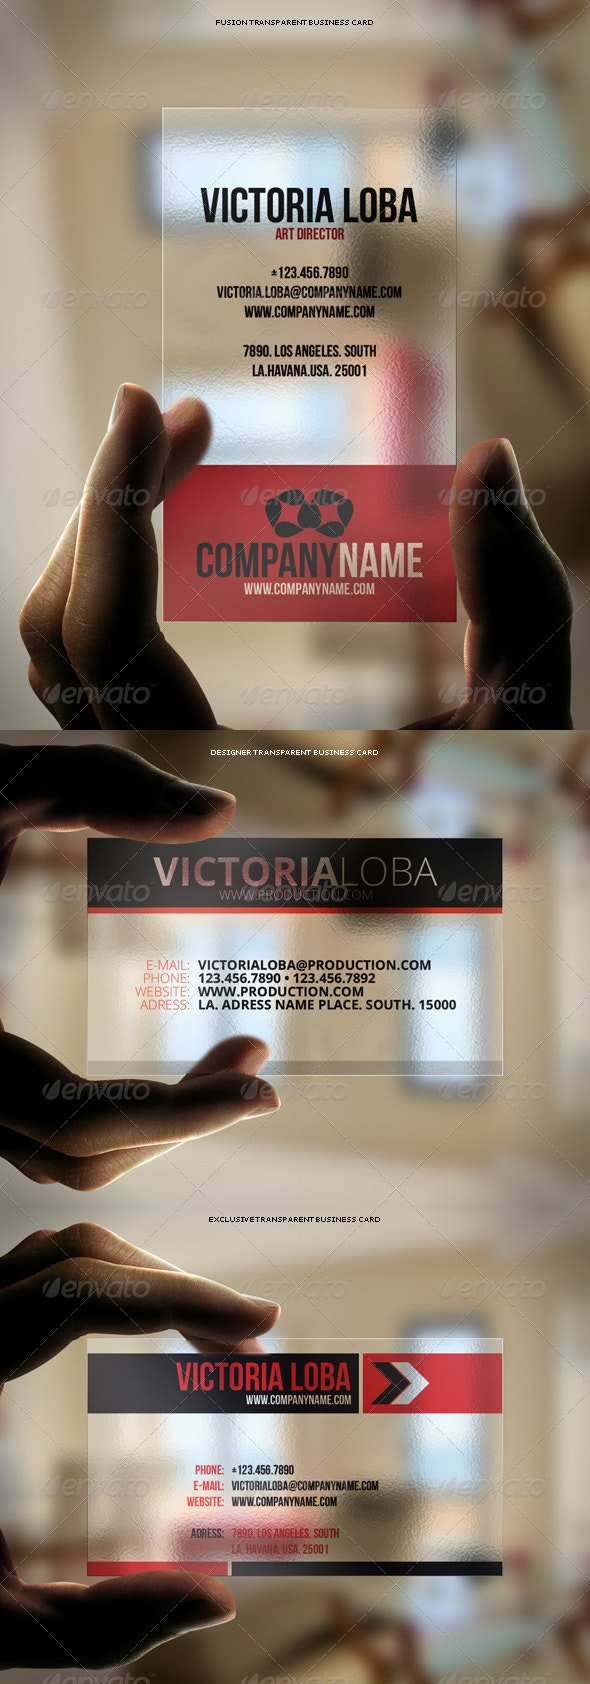 3in1 Transparent Business Cards Bundle #3 - Business Cards Print Templates